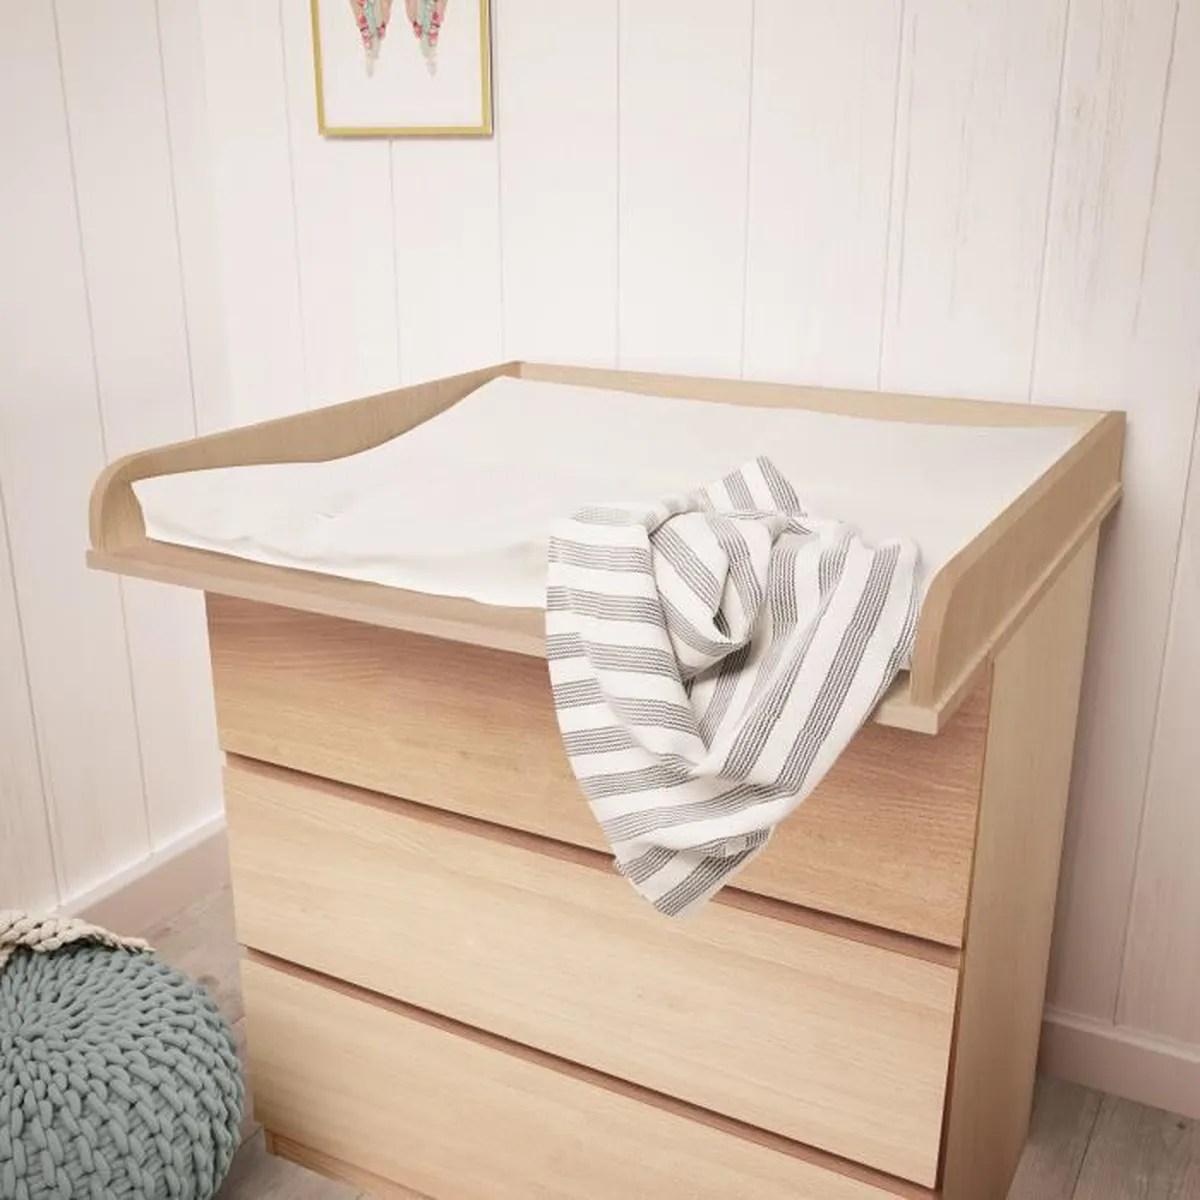 Plan à Langer Polini Kids Pour Commode Ikea Malm Bois